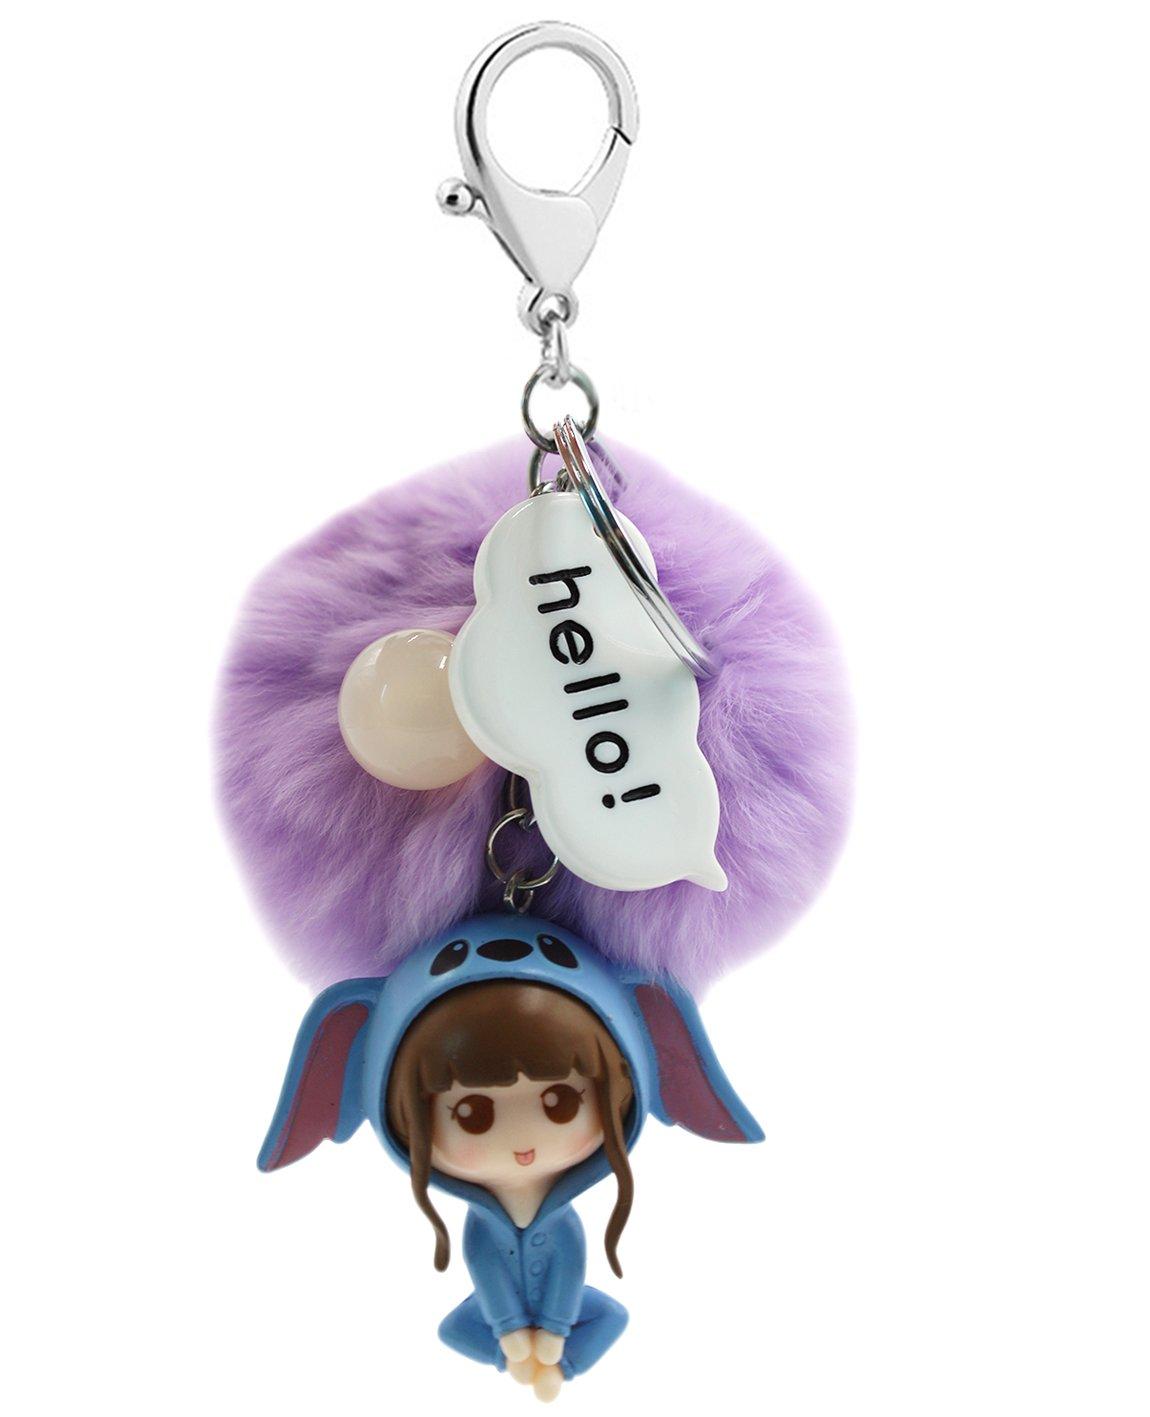 Cute Cartoon Girl Model Key Chain Soft Big Fluffy Ball Key Ring Bag Pendant (Light Purple)